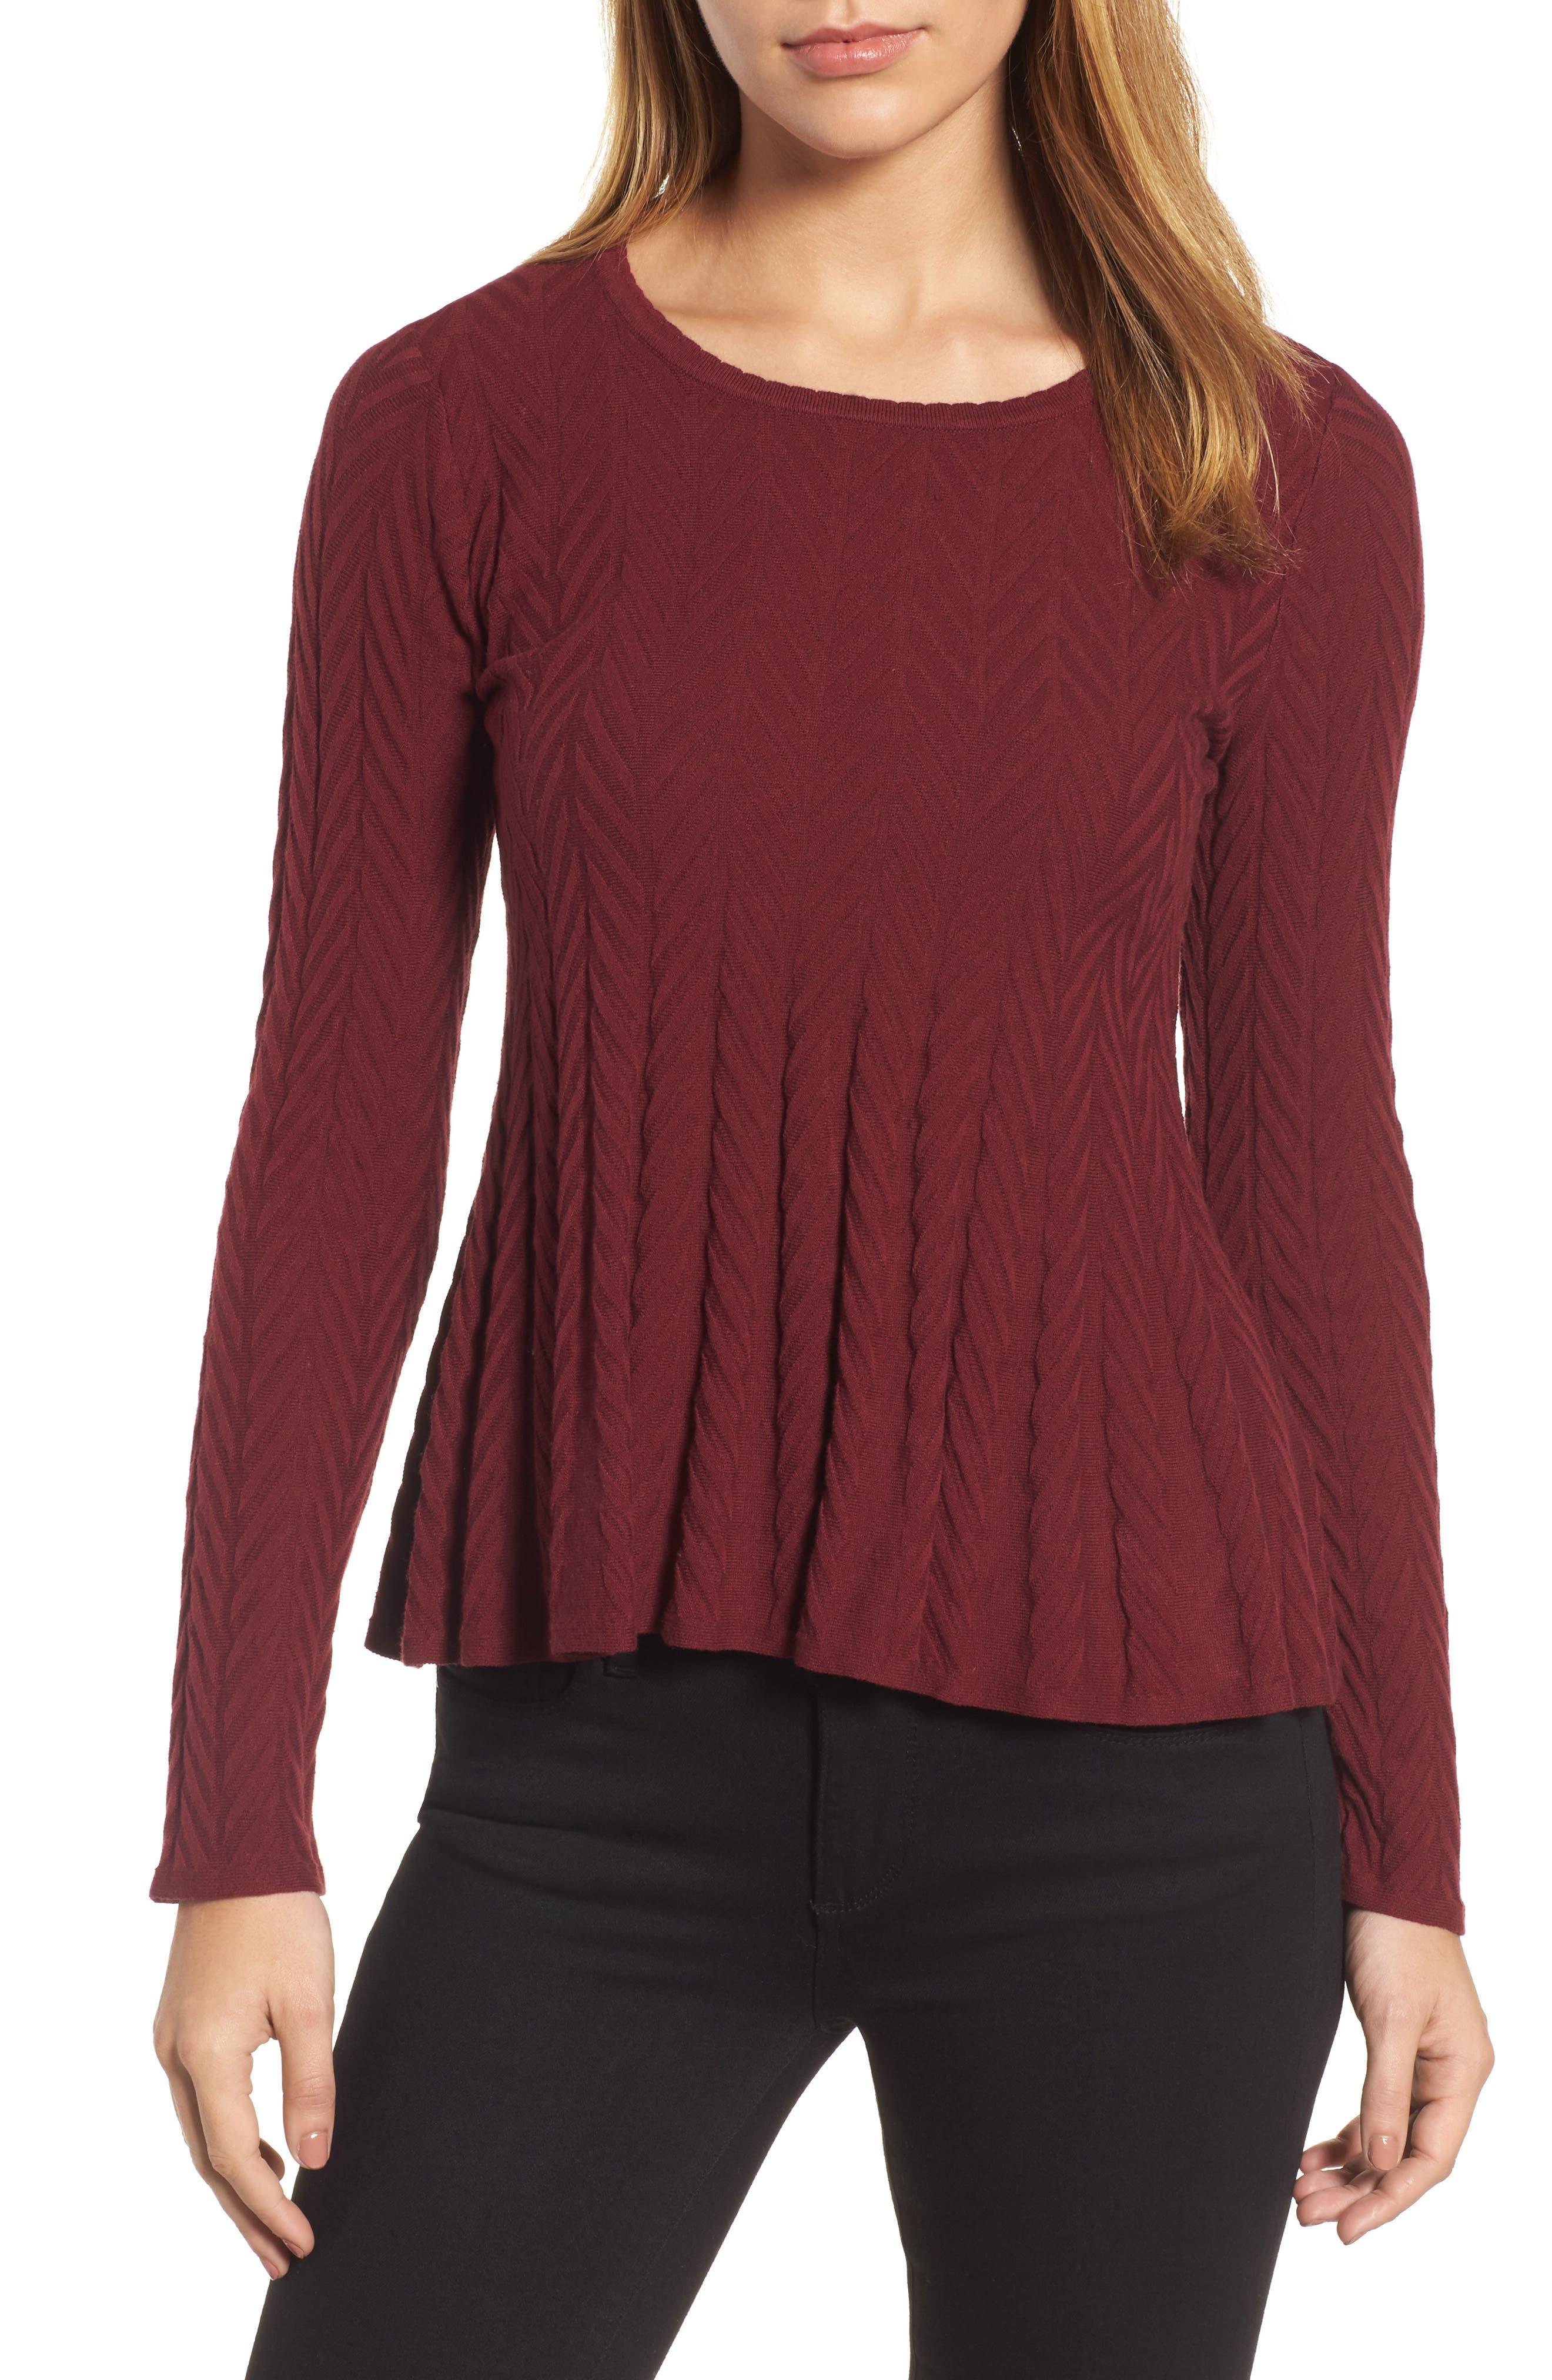 Alternate Image 1 Selected - CeCe Chevron Stitch Sweater